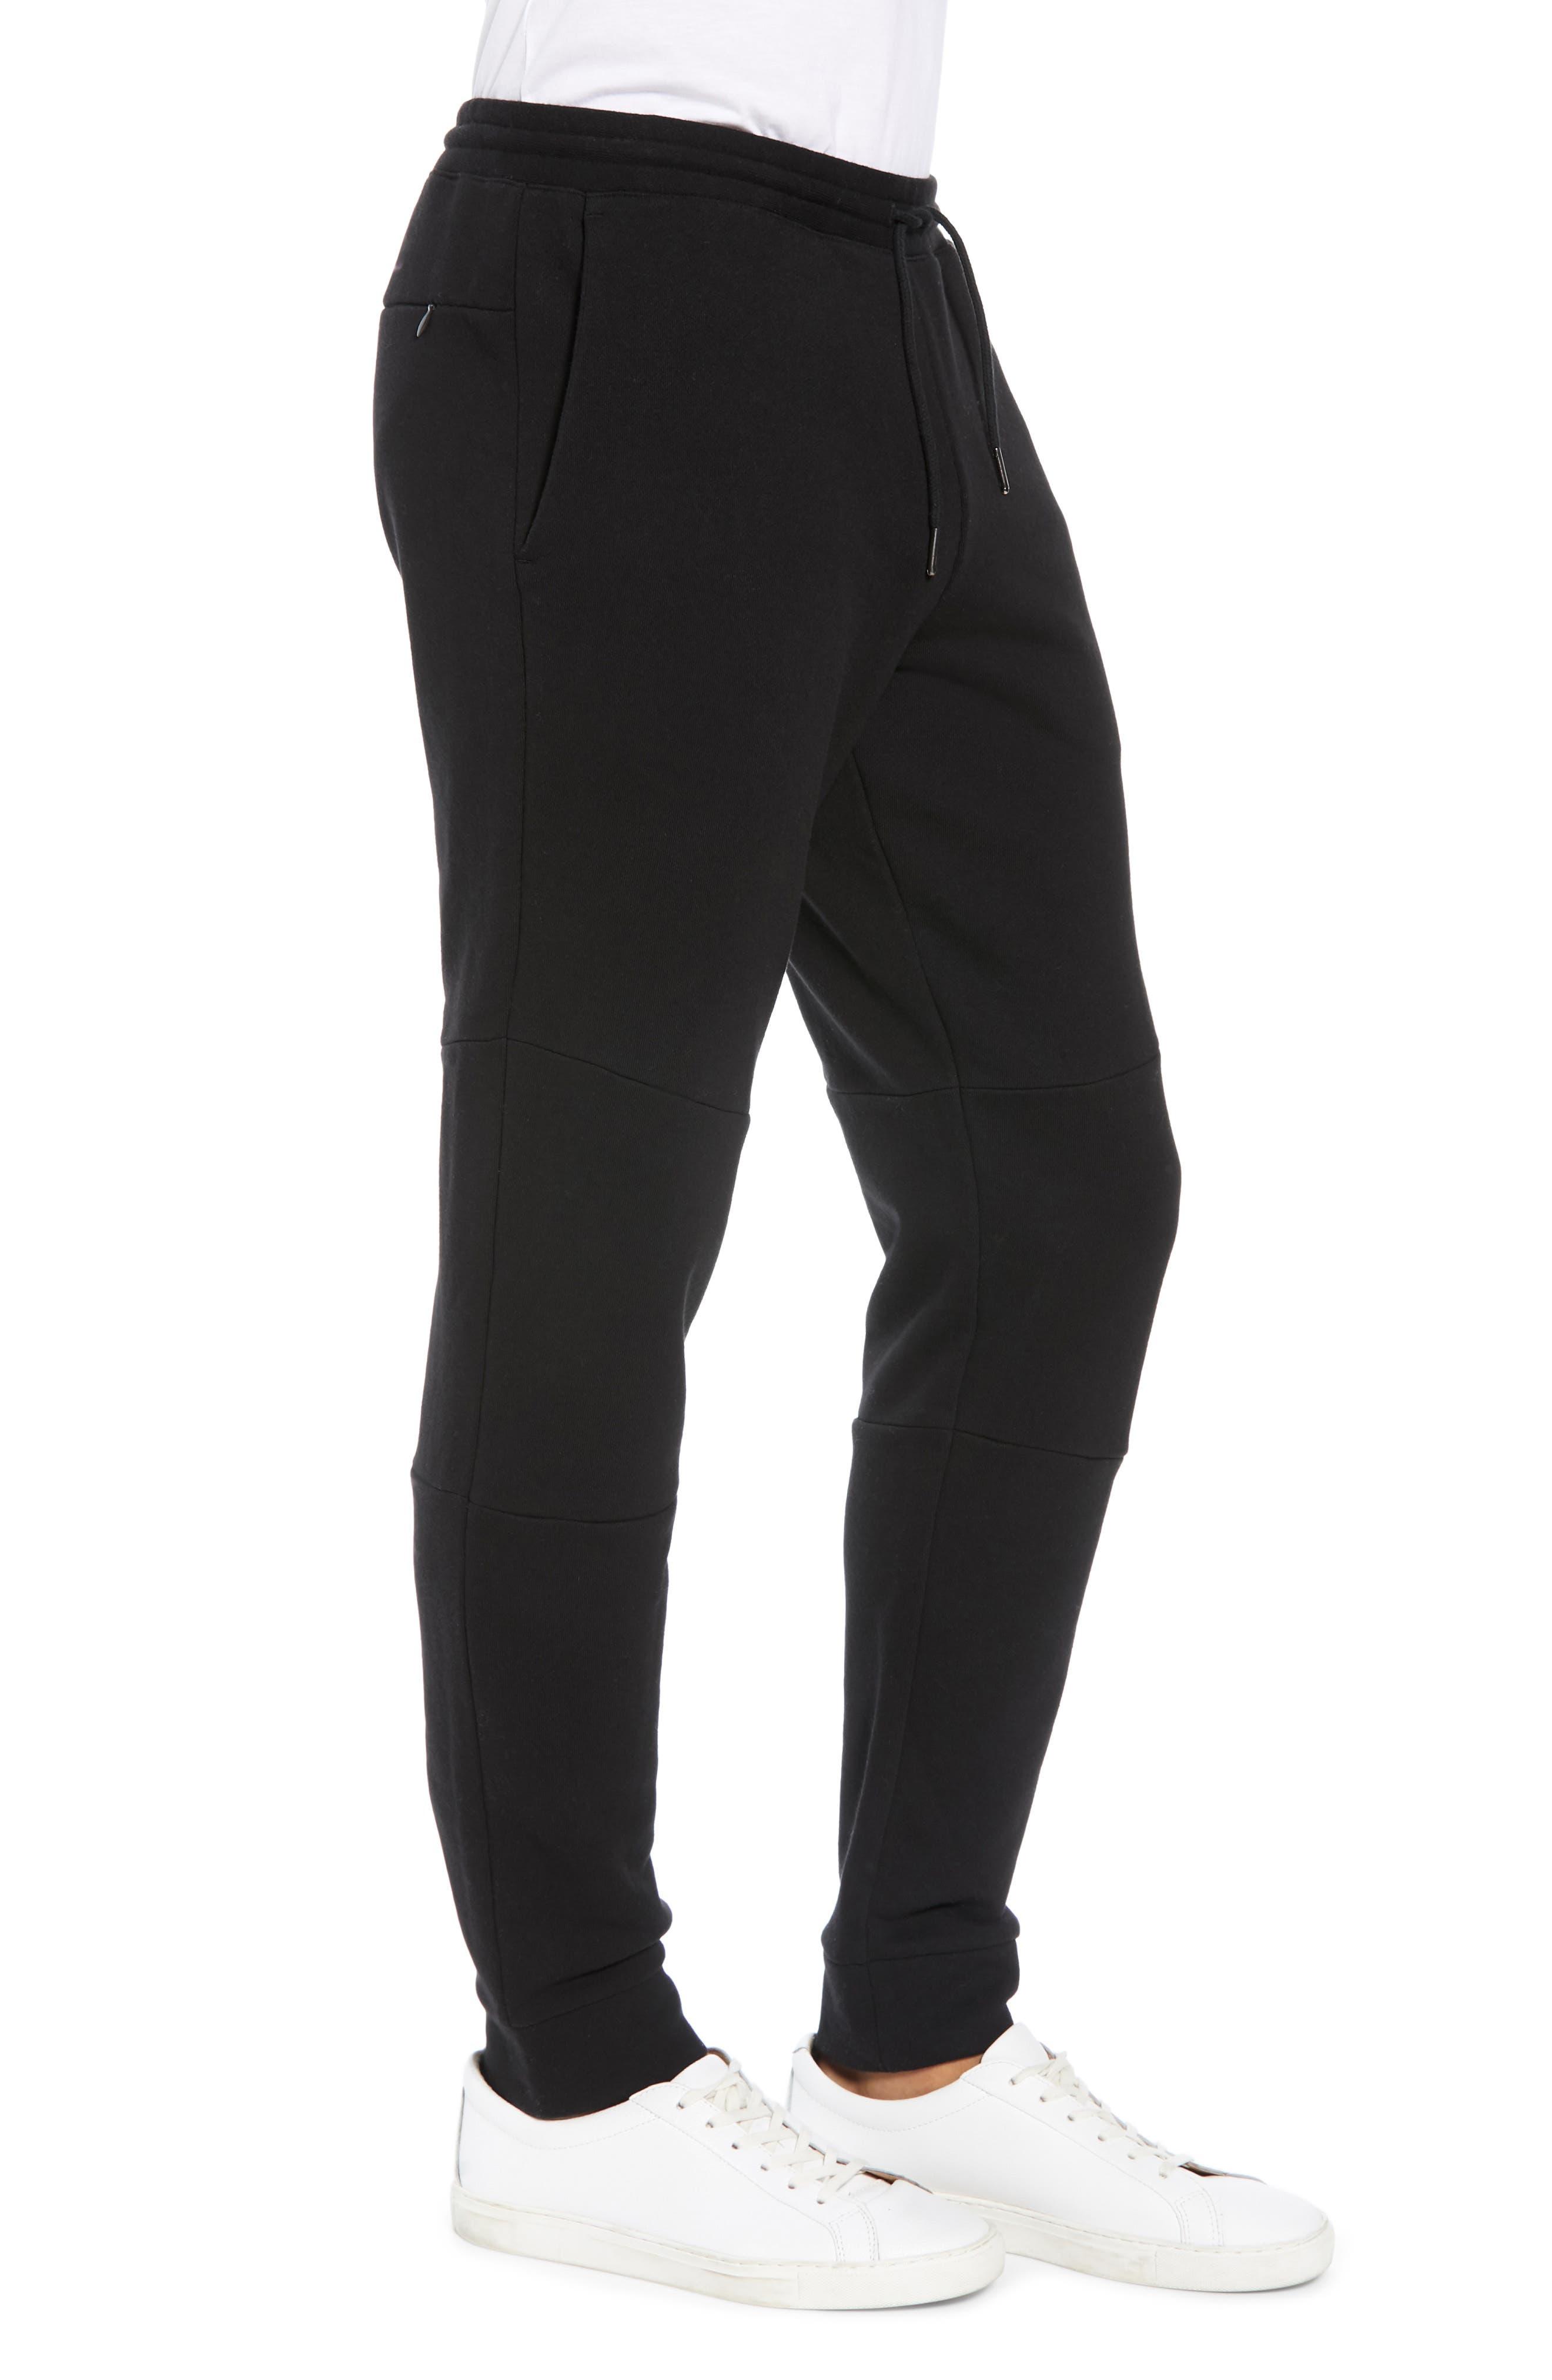 CLUB MONACO,                             Articulated Seam Jogger Pants,                             Alternate thumbnail 3, color,                             001